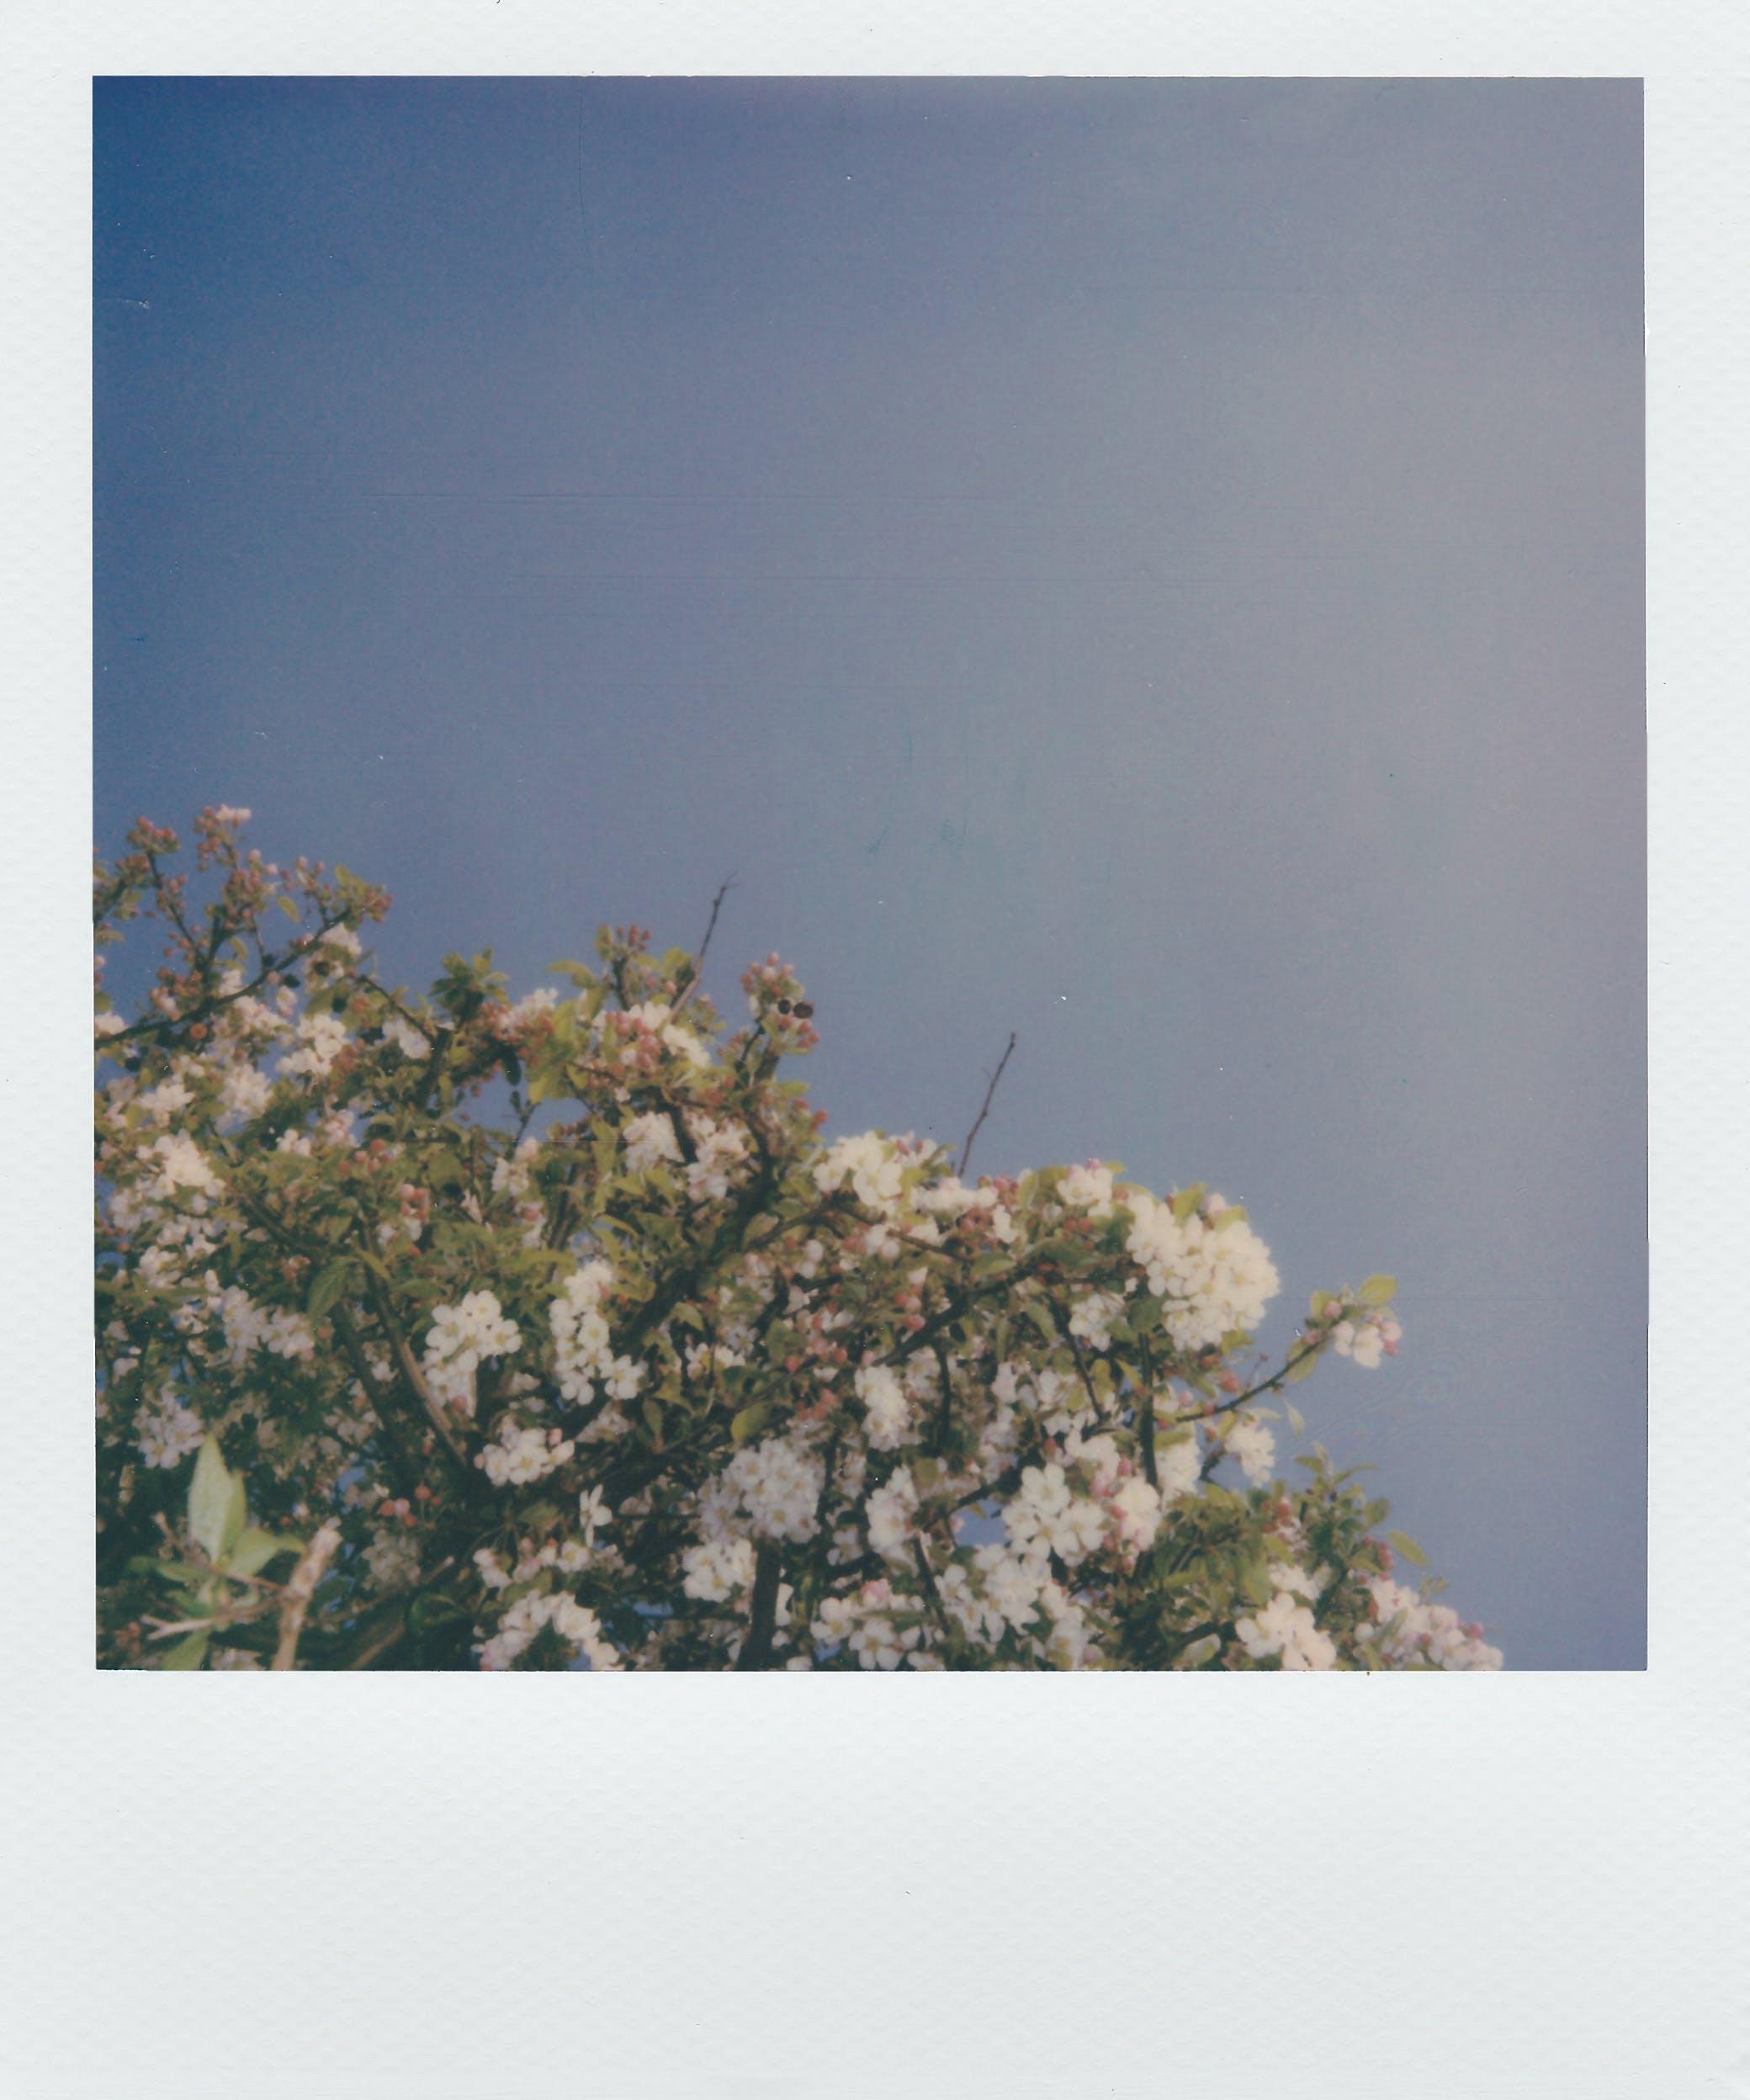 analoge fotografie, blumen, bündel